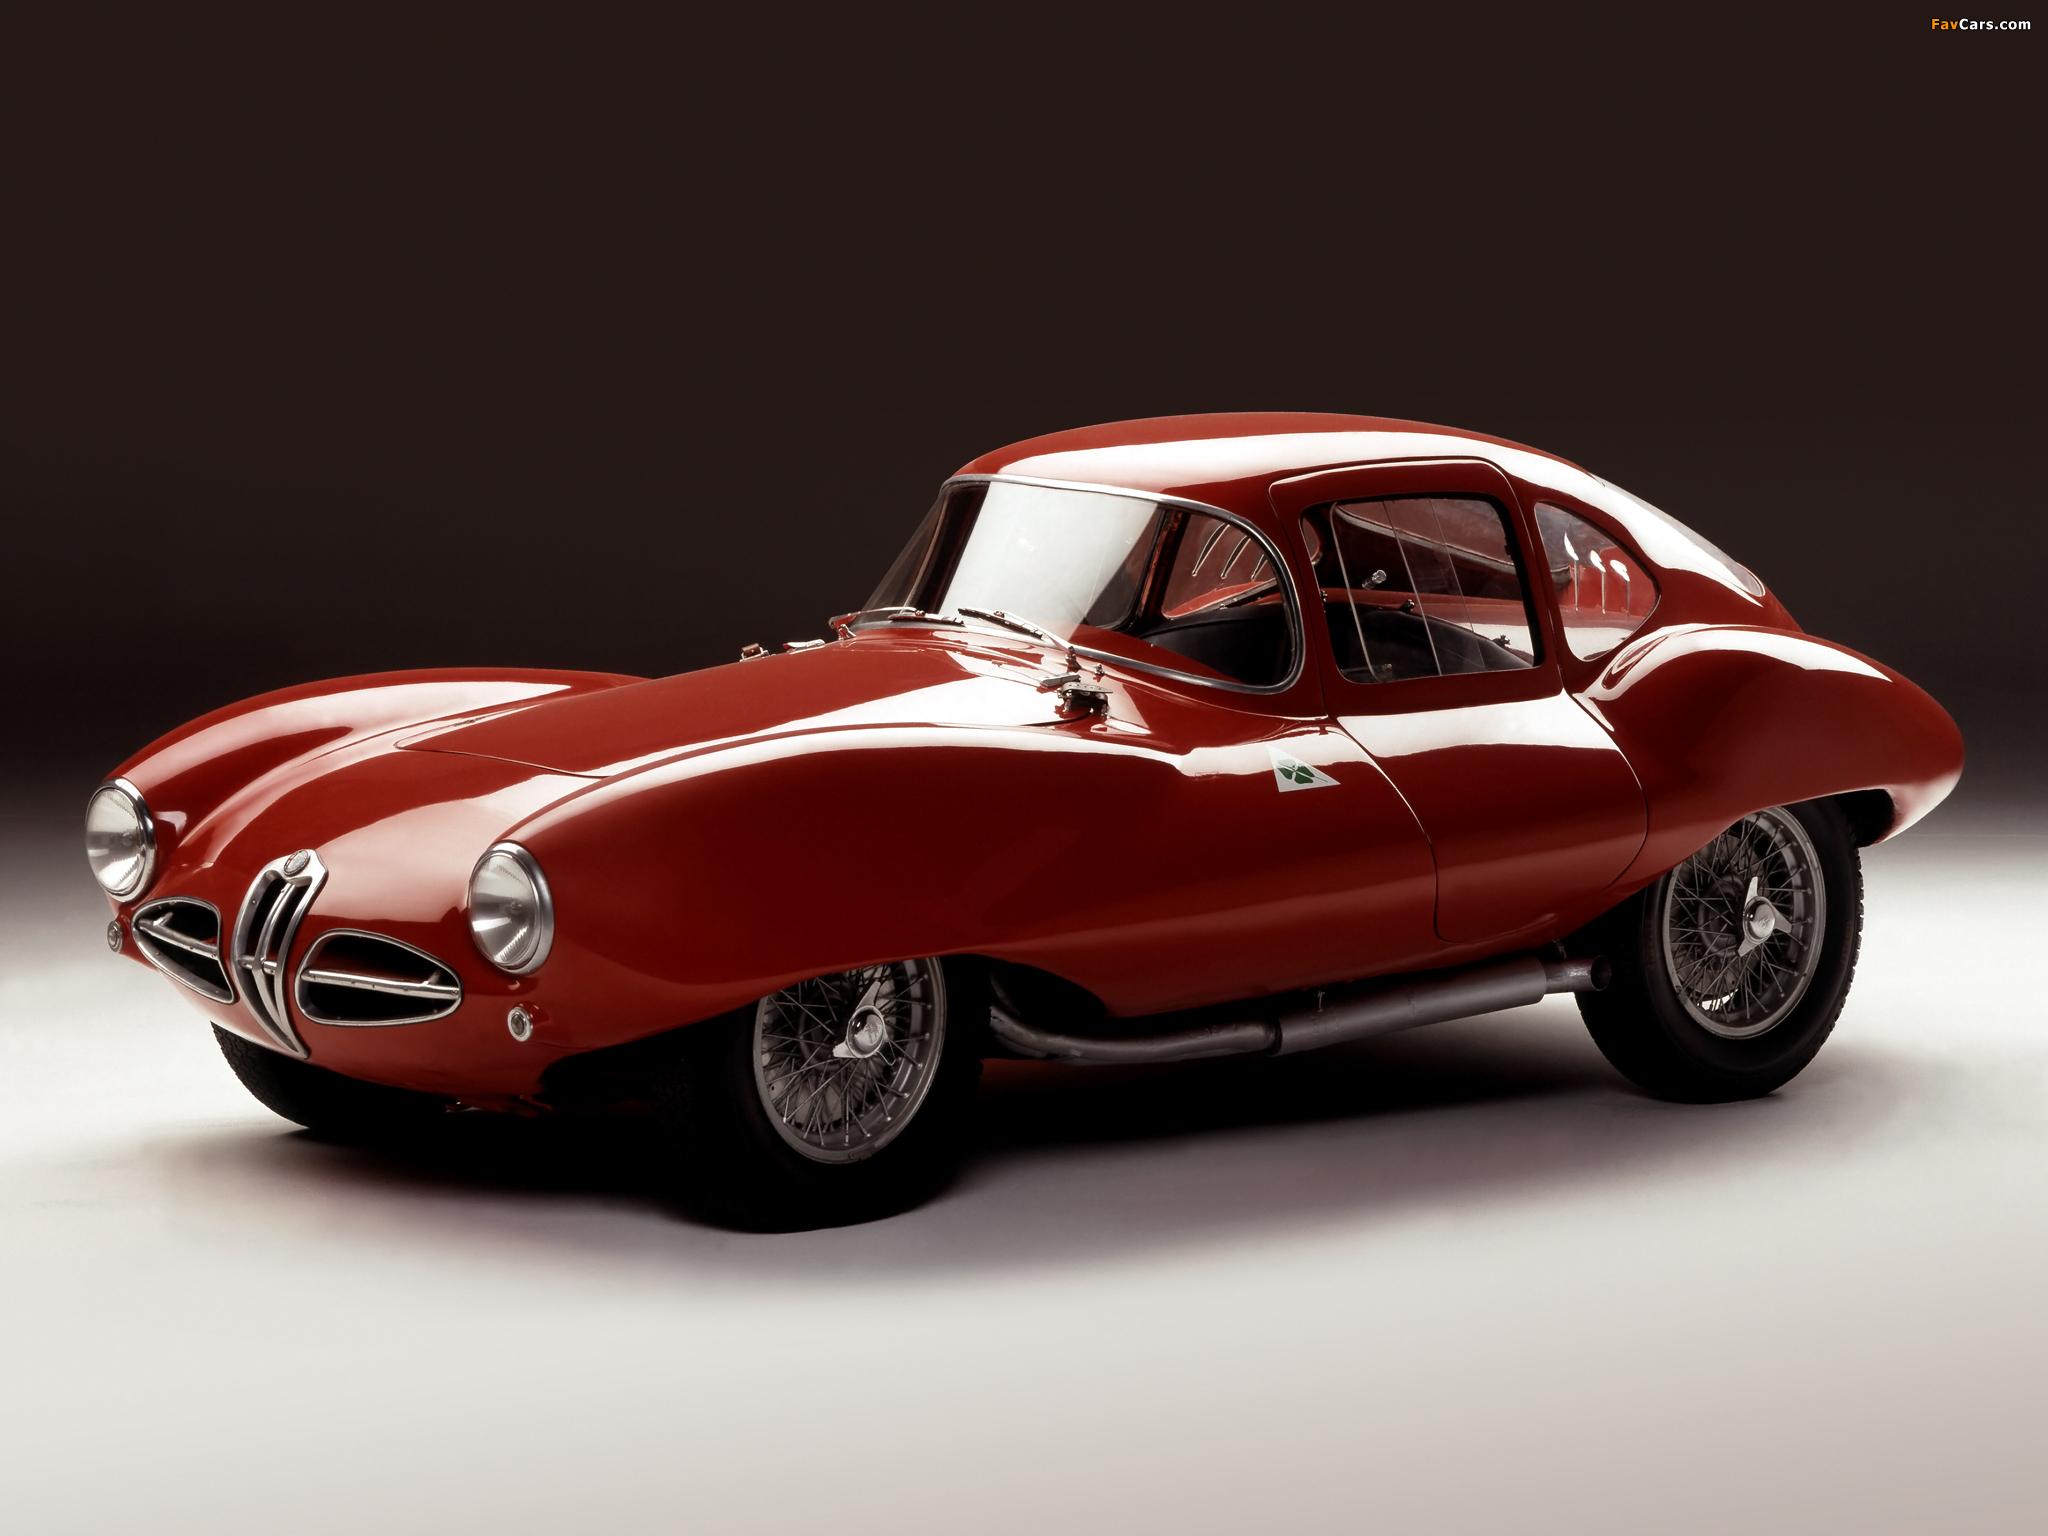 Alfa Romeo 1900 C52 Disco Volante Coupe 1359 (1953) wallpapers (2048 x 1536)